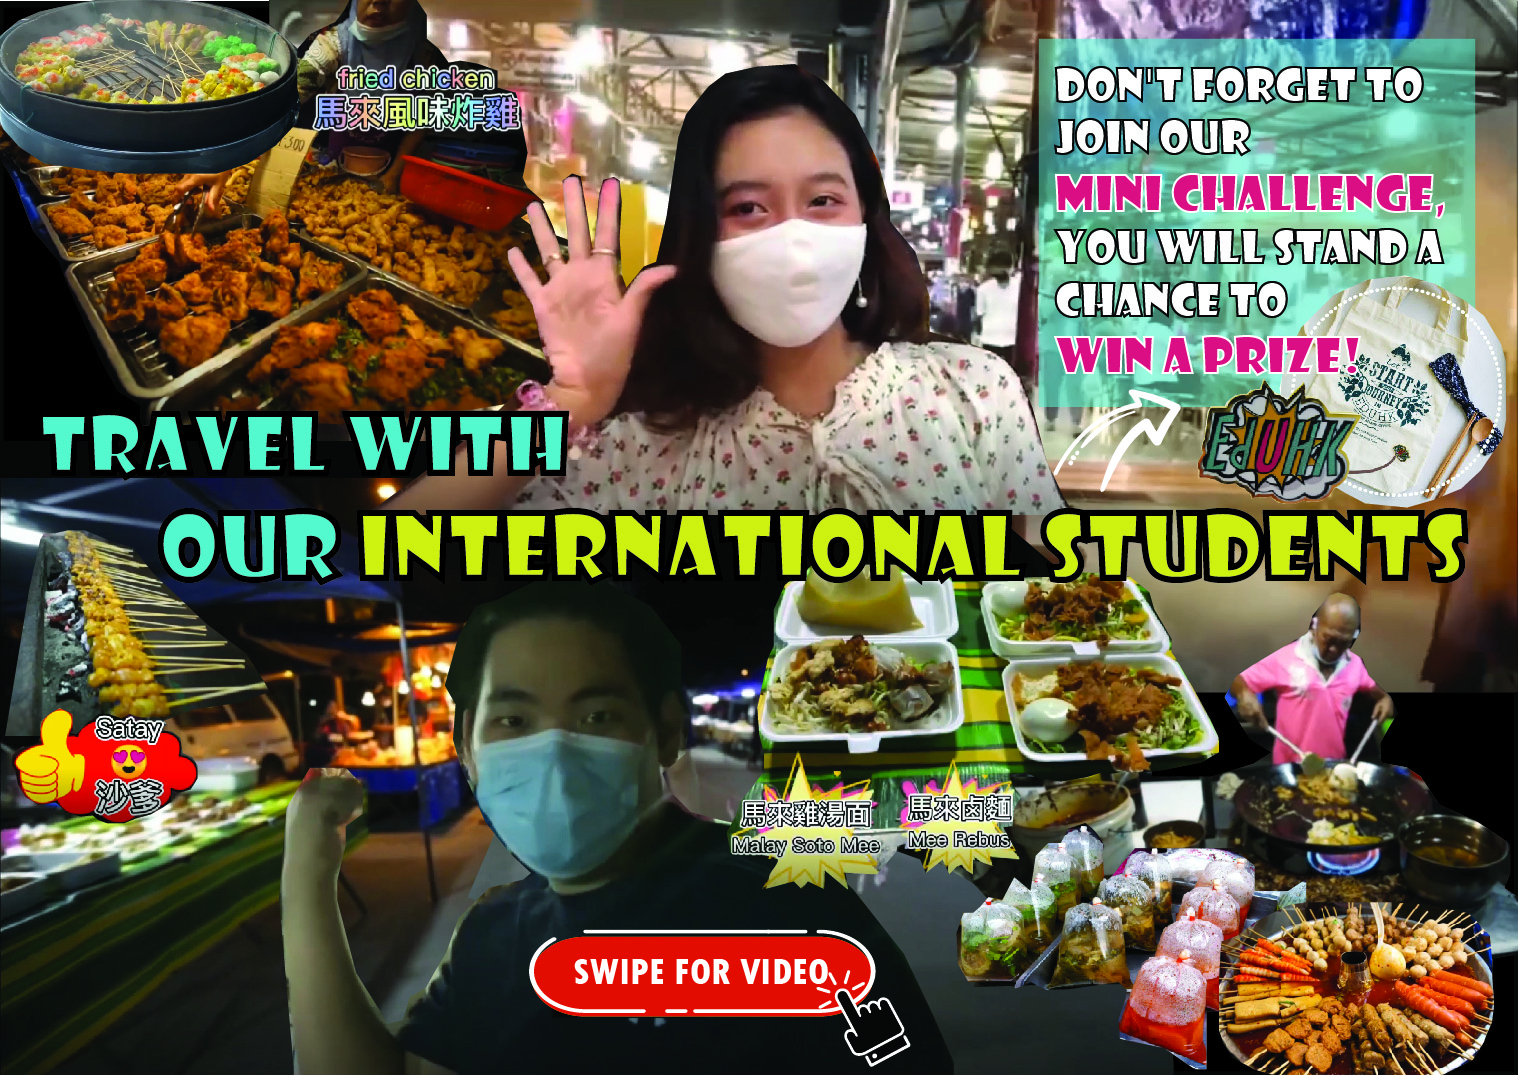 Travel with Internationals